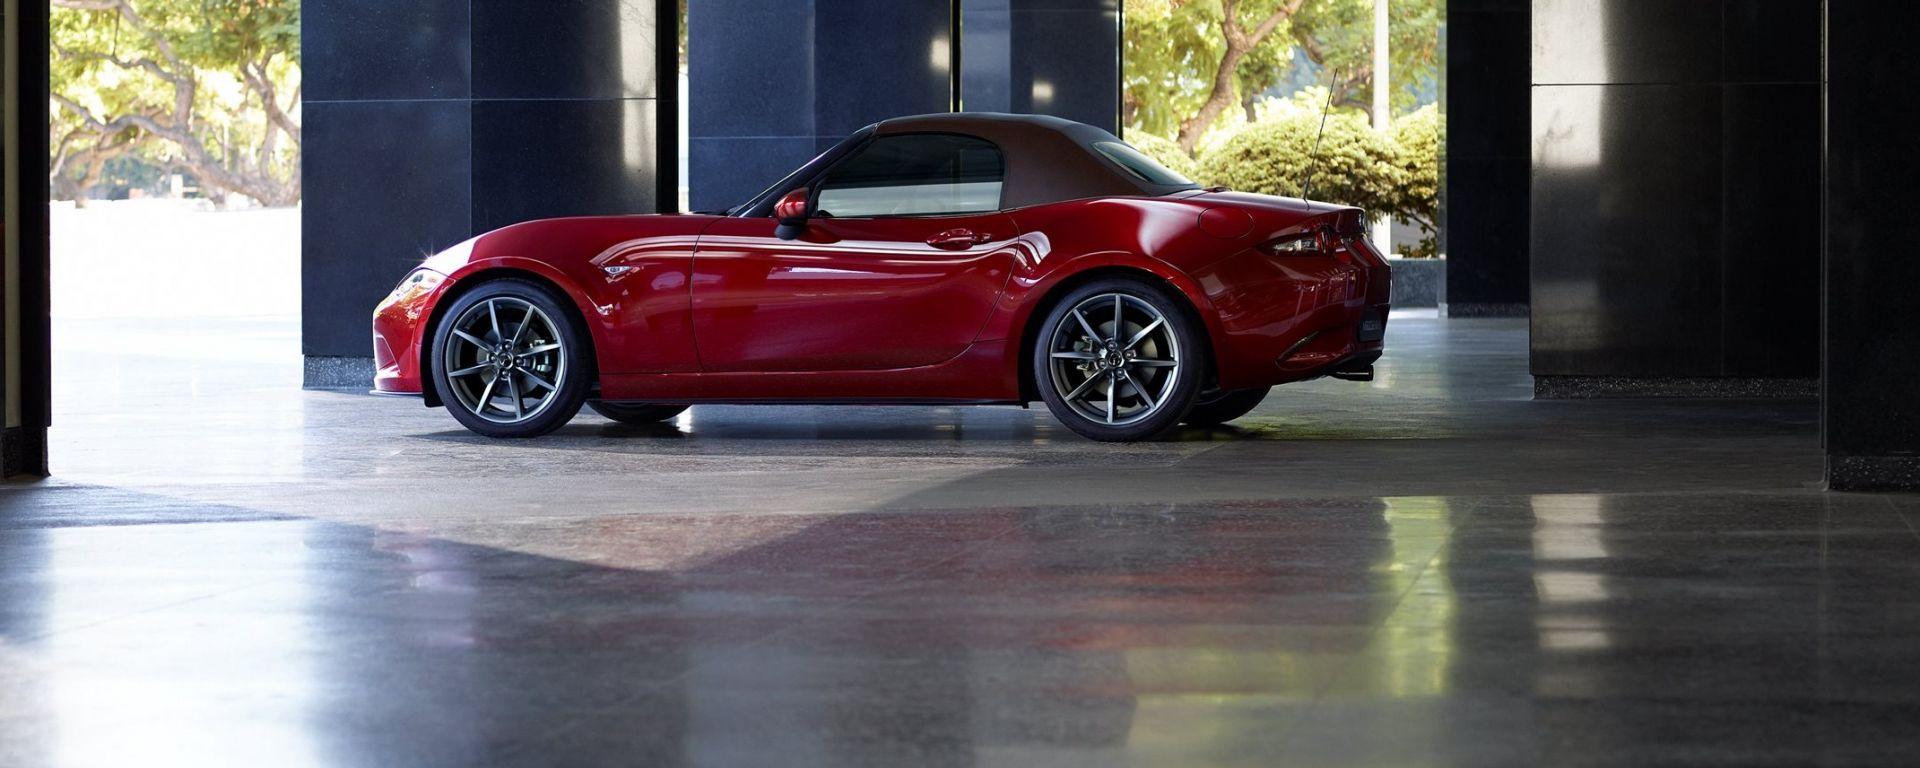 Mazda MX-5 2019: vista laterale